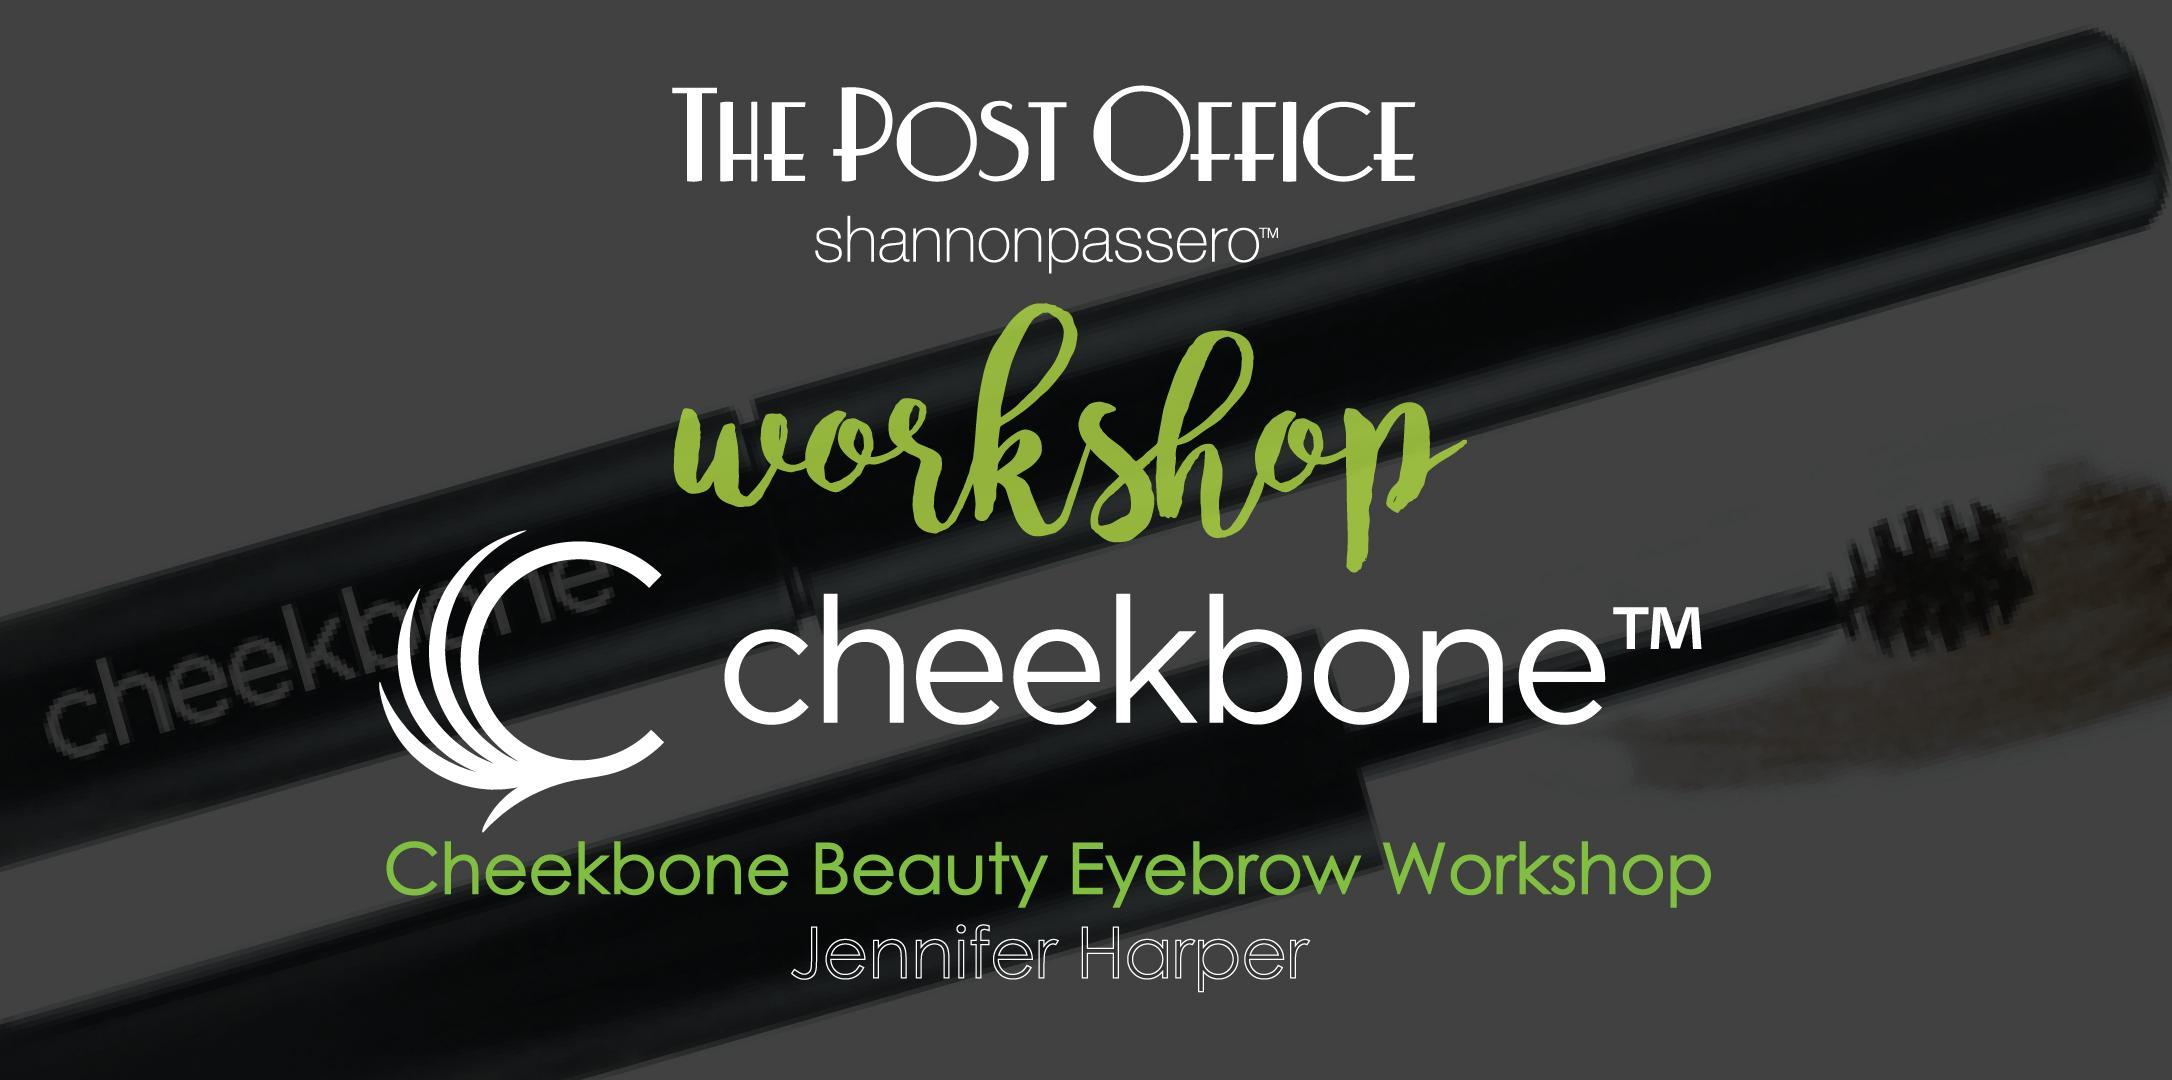 Cheekbone Beauty Eyebrow Workshop